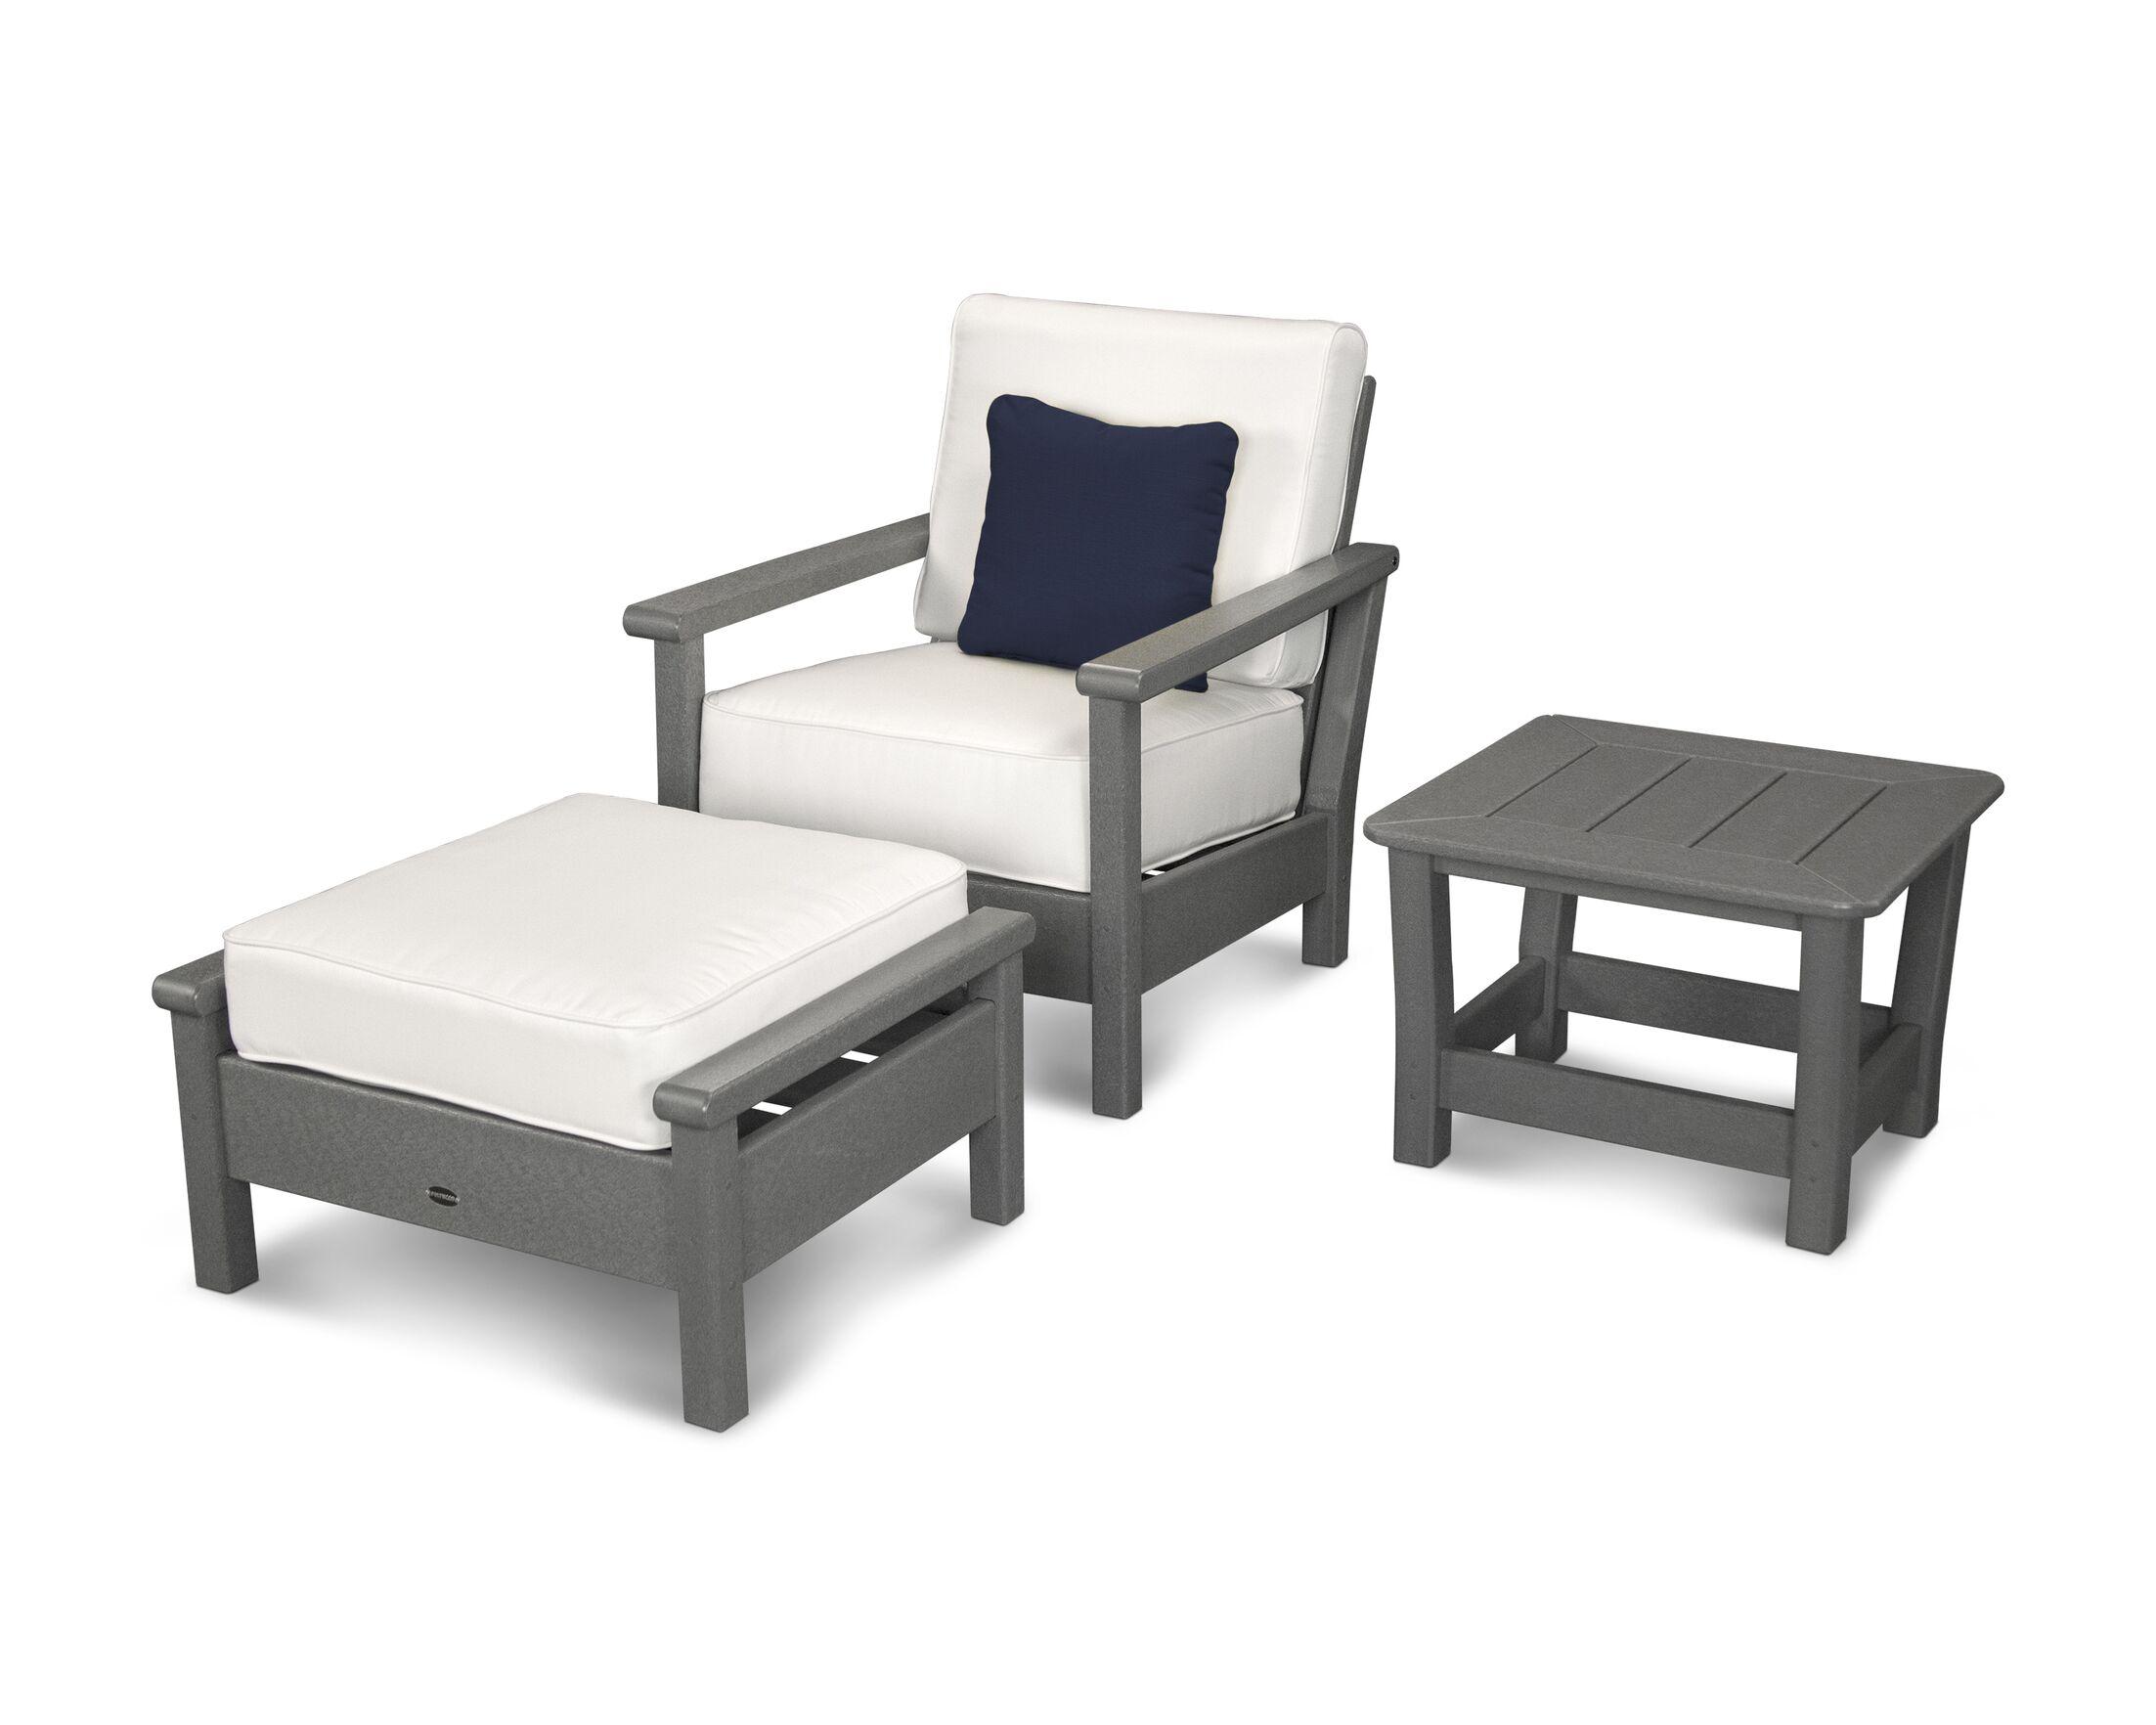 Harbour 3 Piece Sunbrella Conversation Set with Cushion Color: Slate Grey / Natural